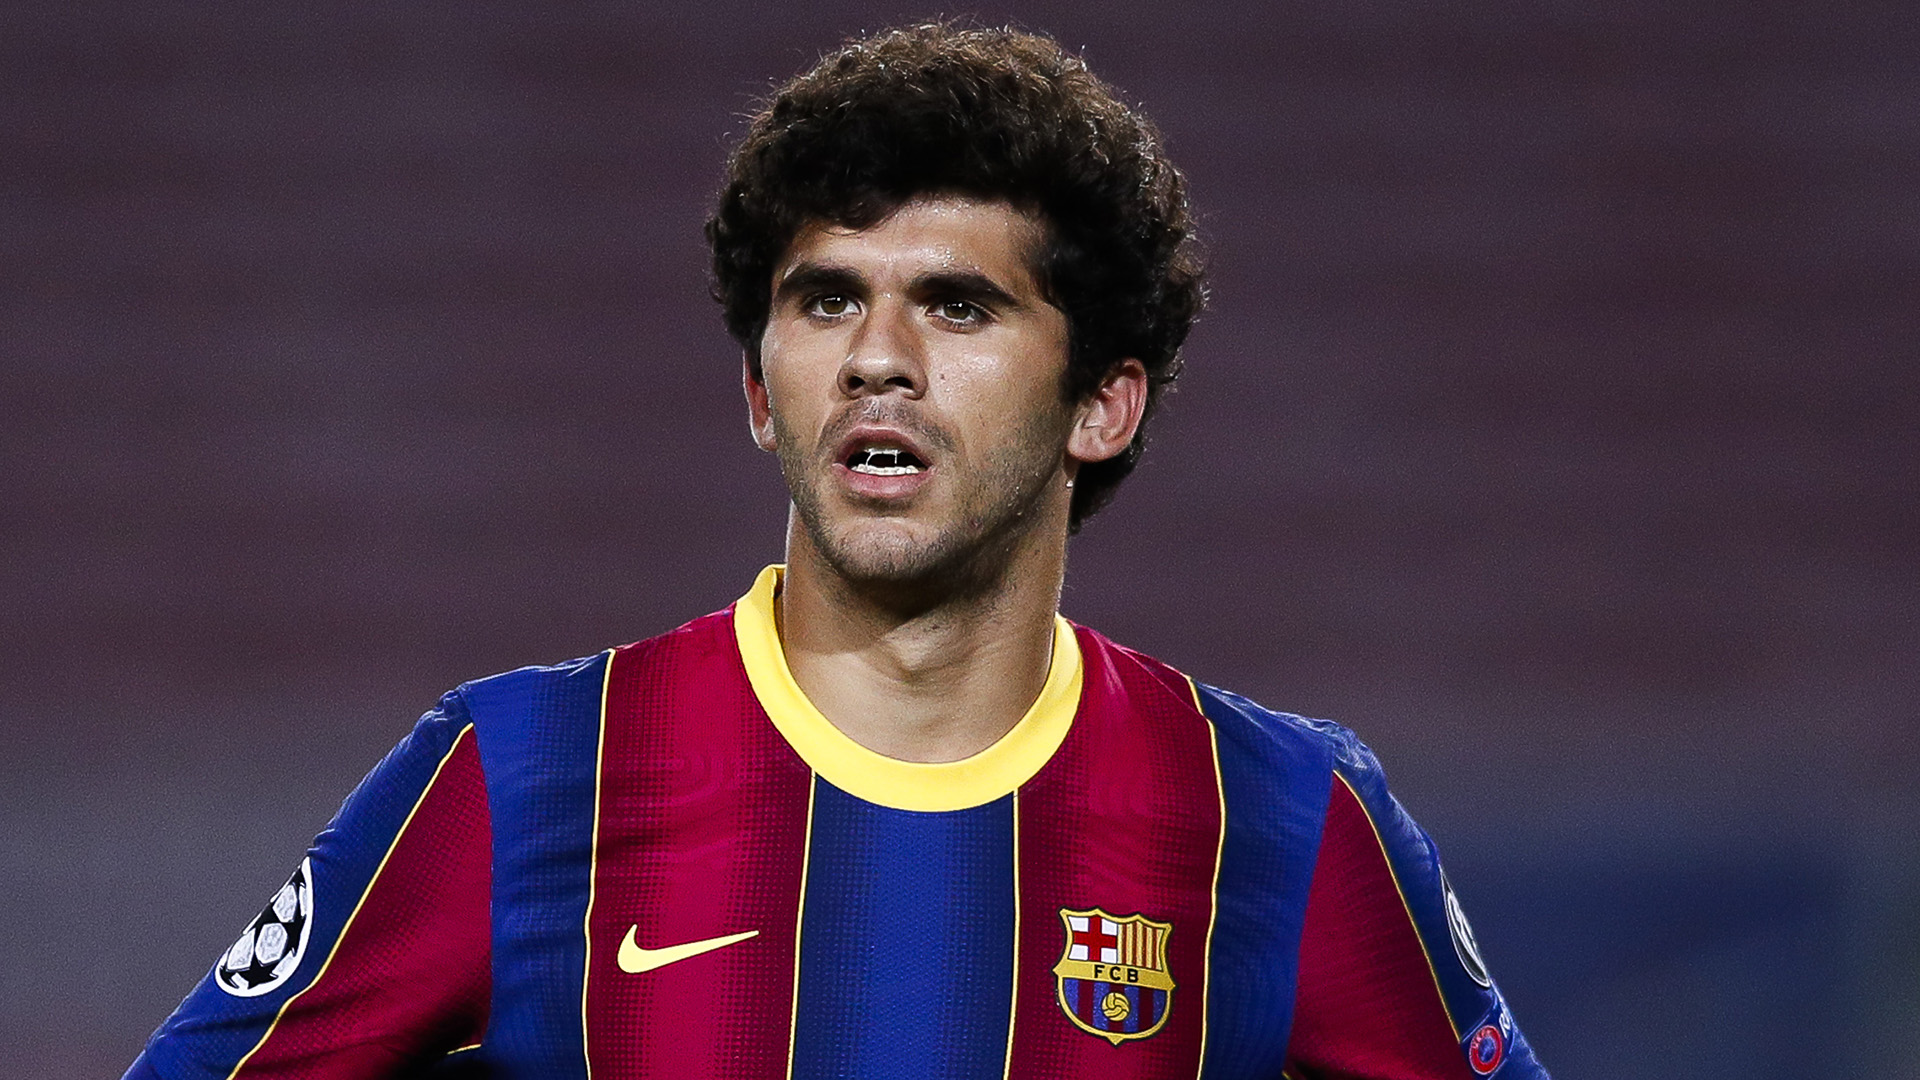 Alena sold to Getafe as Barcelona continue Messi fundraising mission |  Goal.com